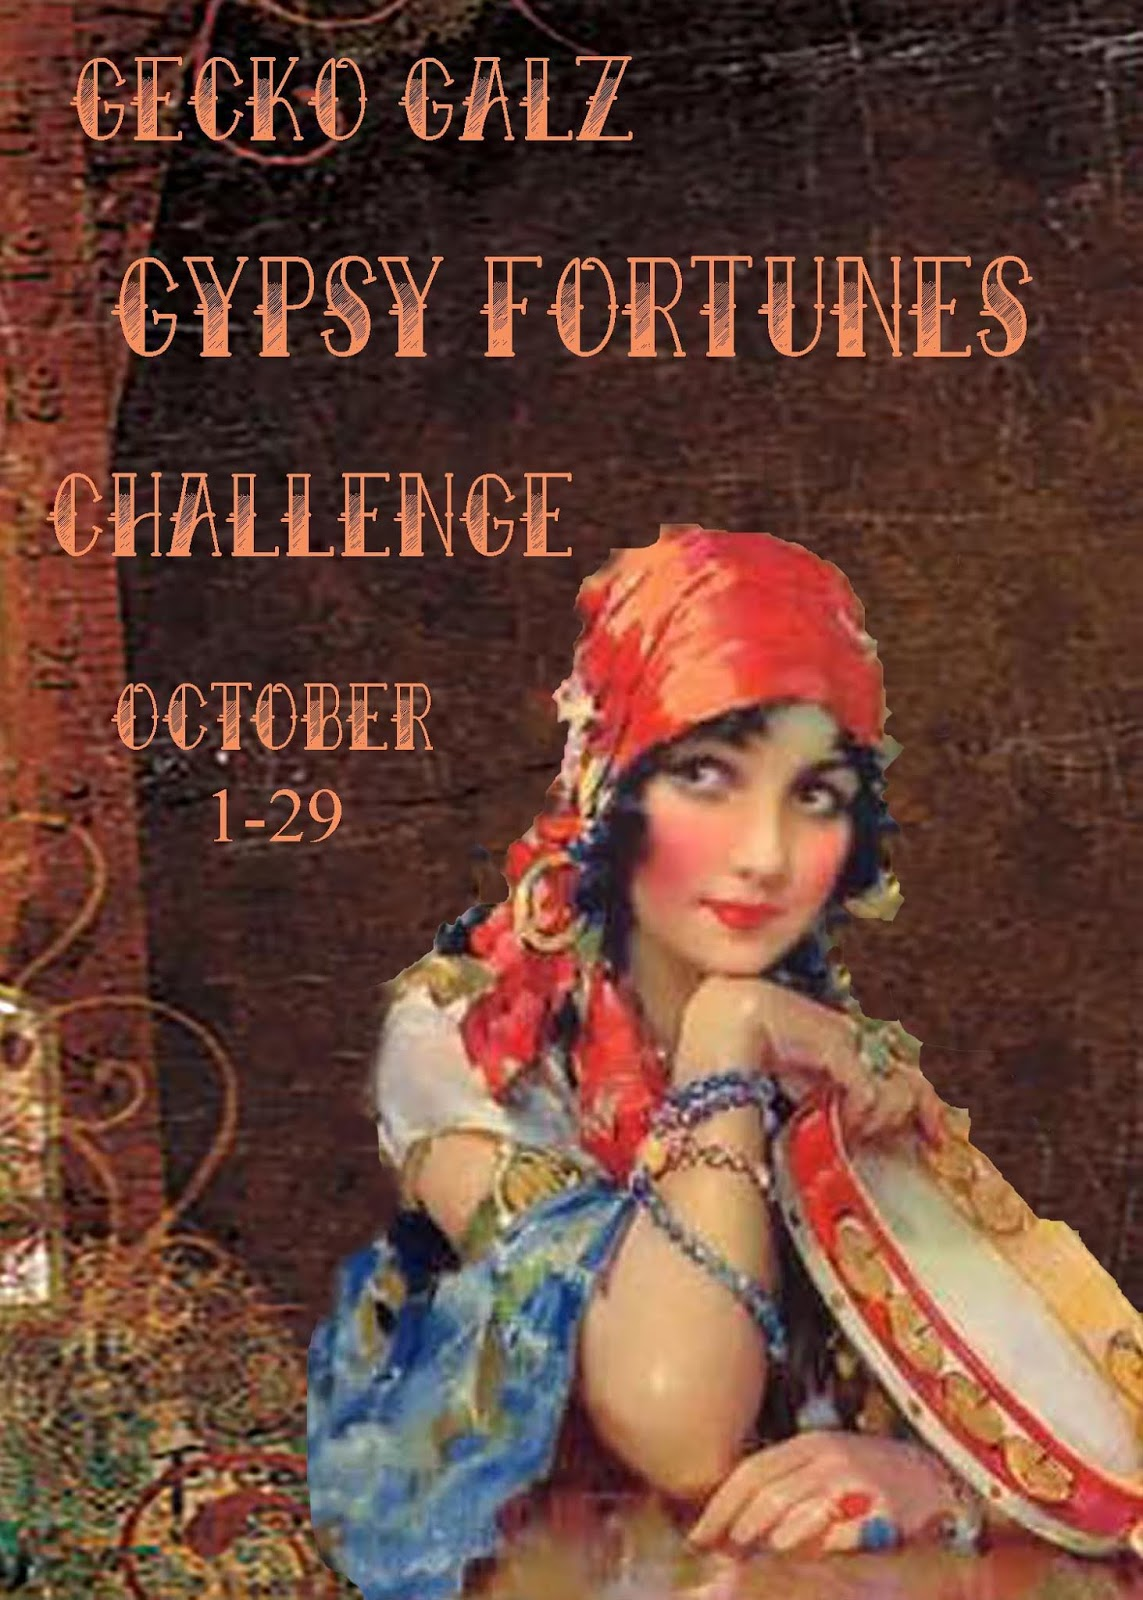 Gypsy Fortune Challenge